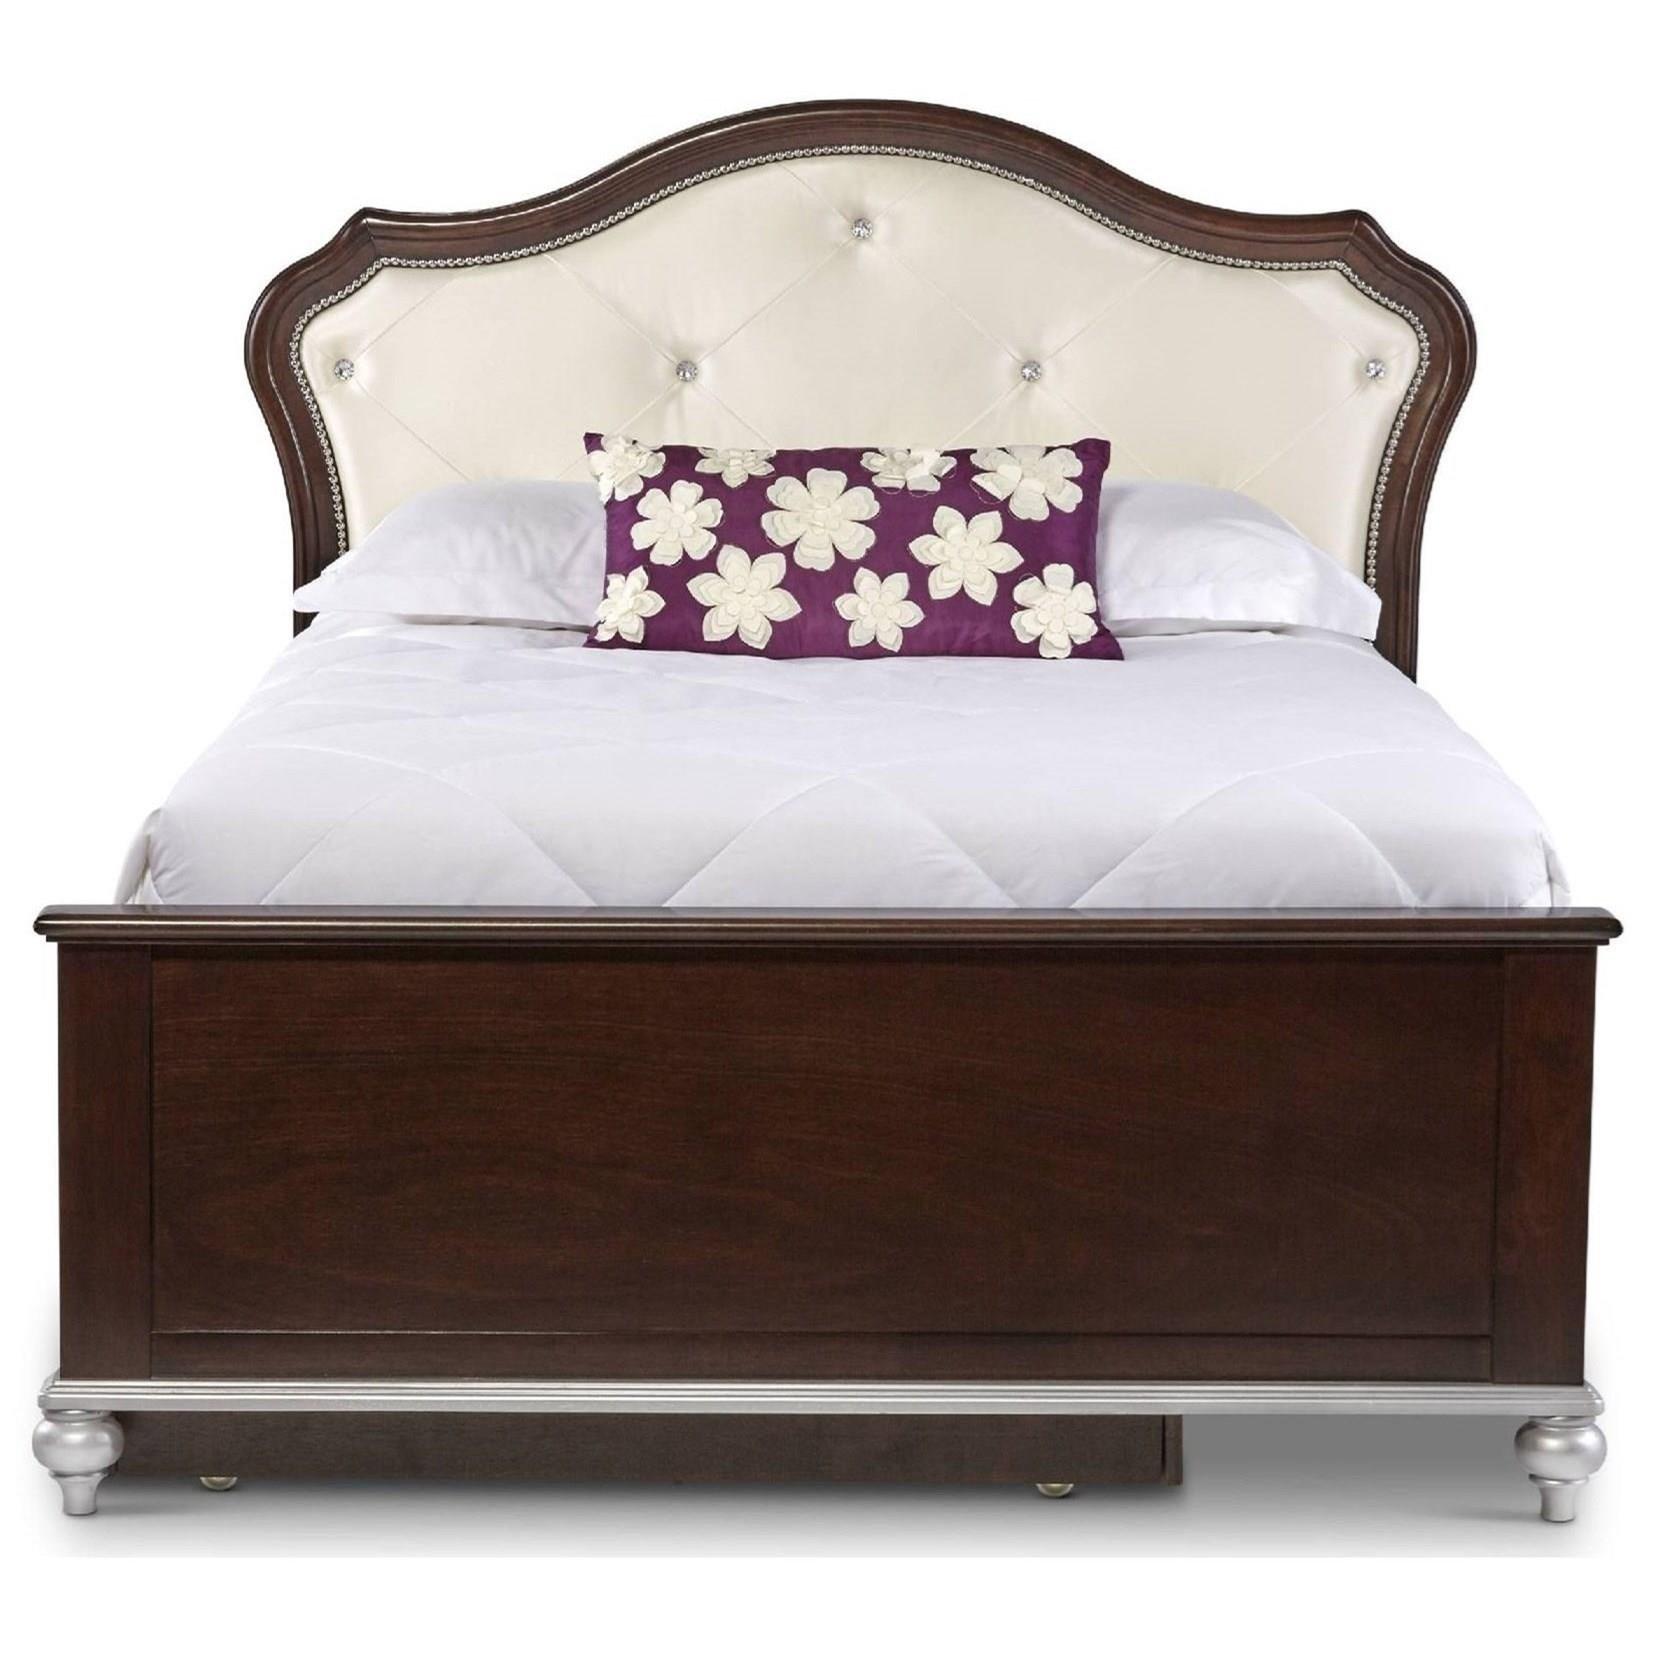 Elements International Allison Al300fb Full Bed With